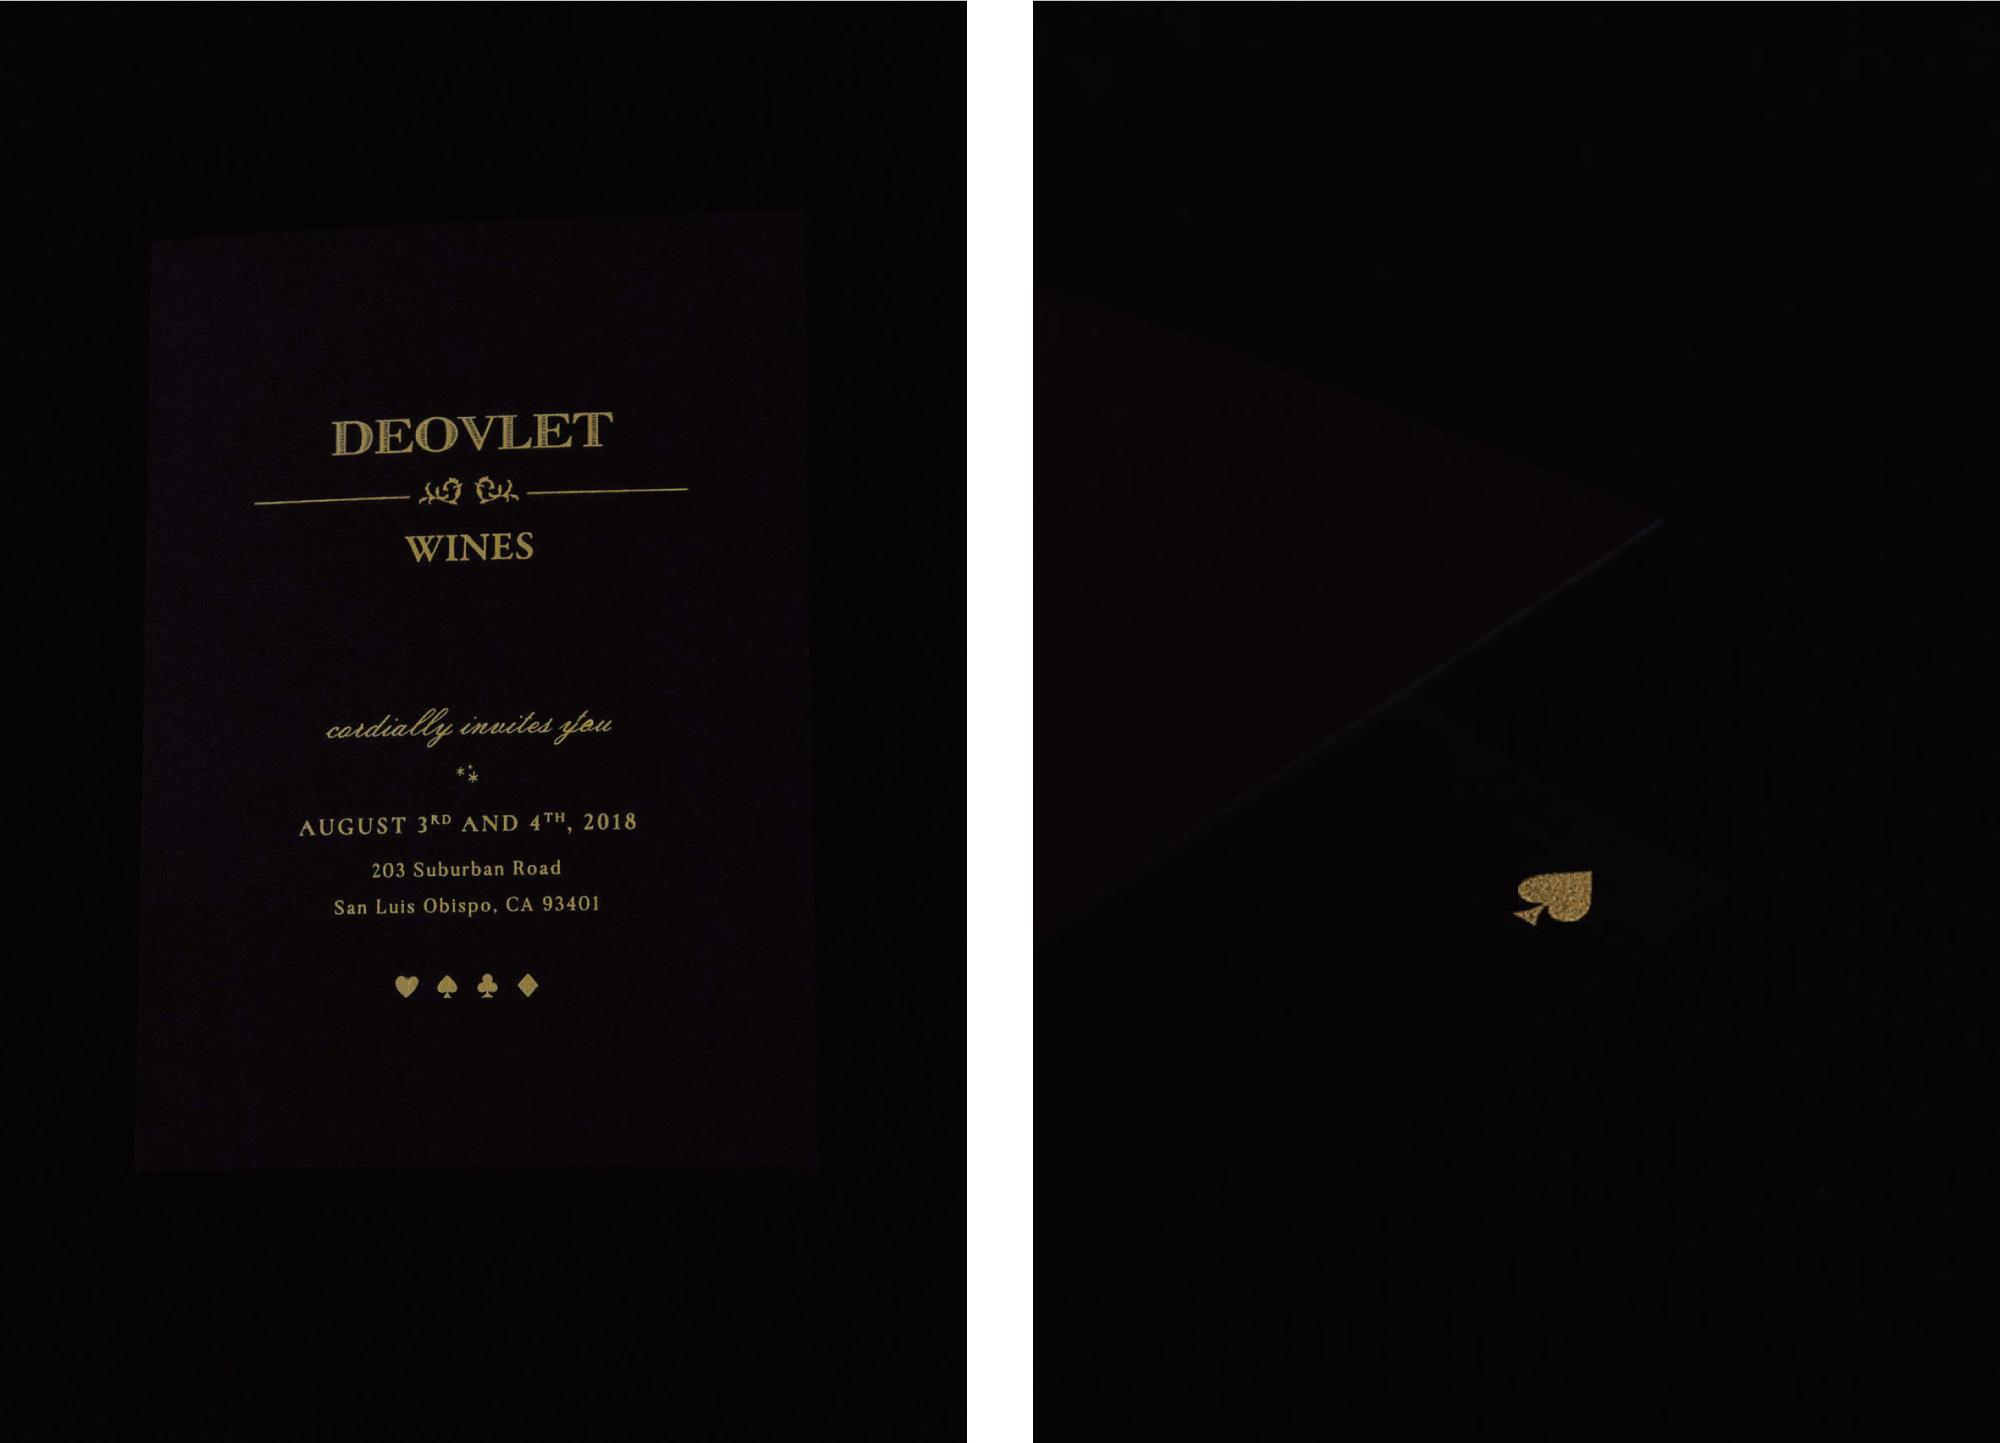 San Luis Obispo Luxury Stationery Designer Amarie Design Co. invitation suite design, Gold Metallic Foil on Black Paper for Winery